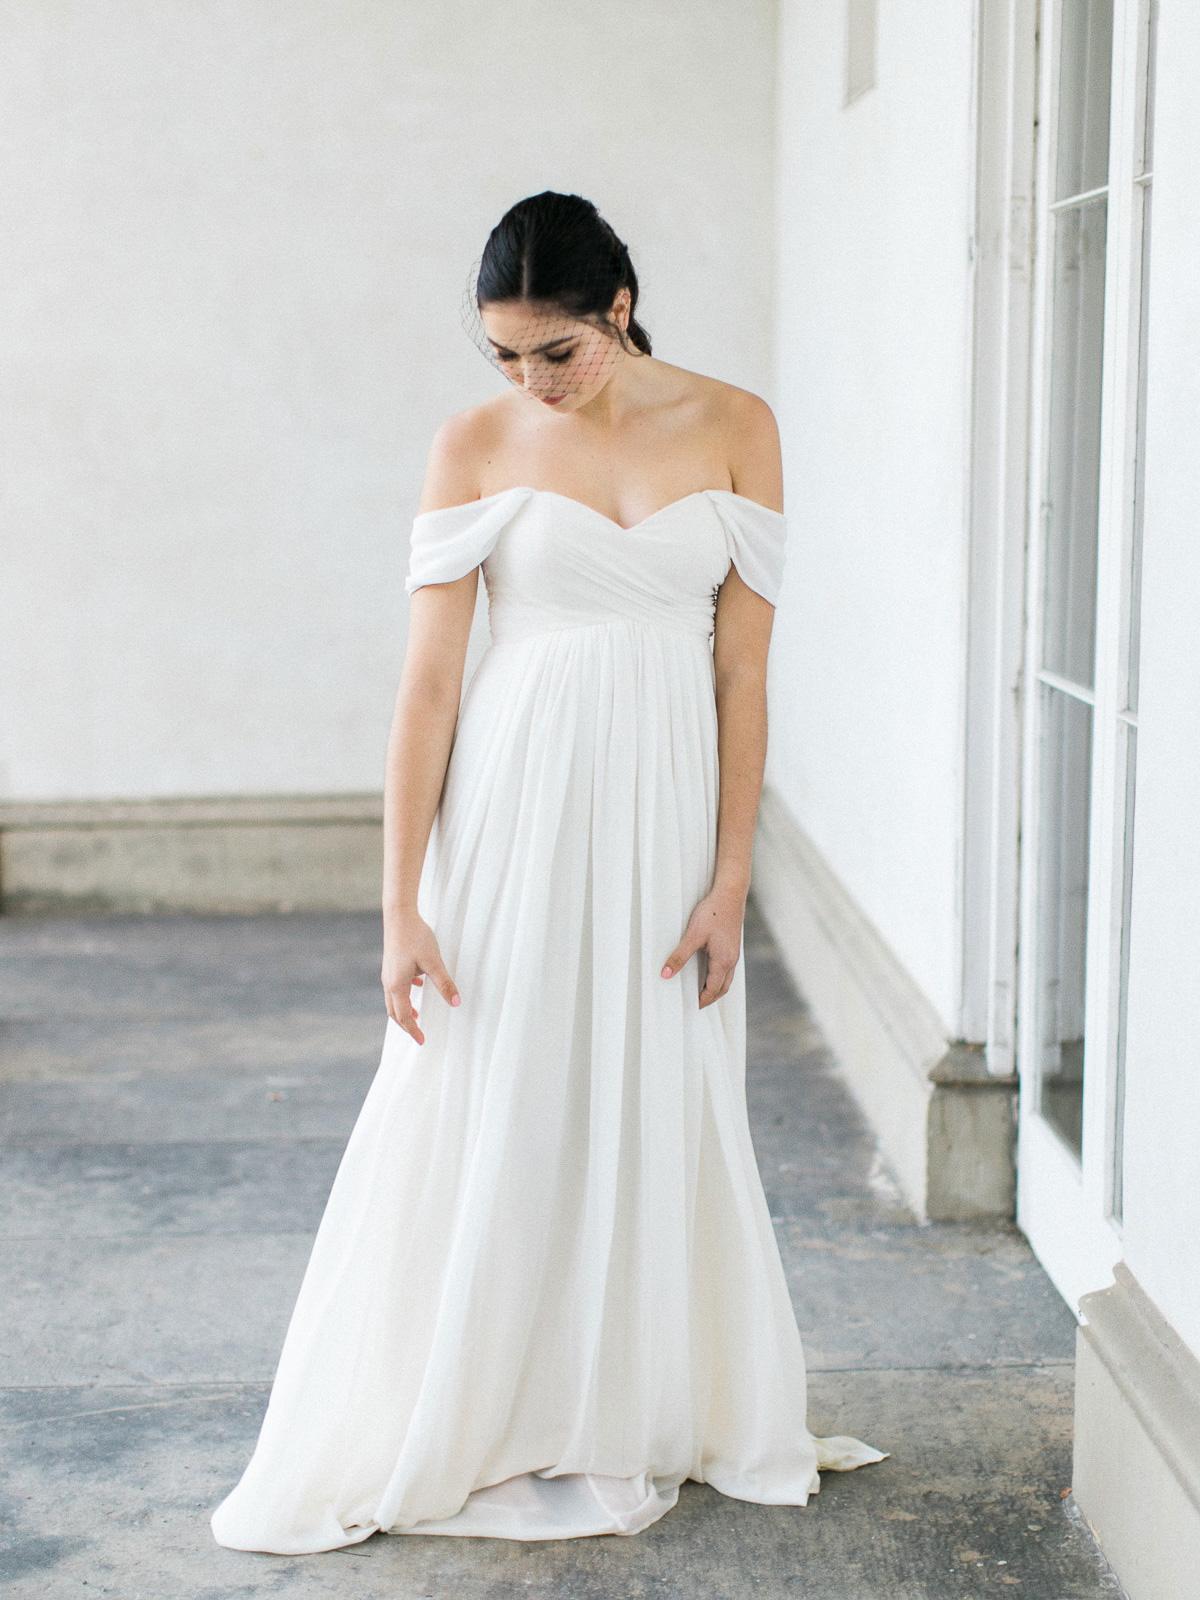 kurtz-orpia-photography-vineyard-bride-swish-list-dundurn-castle-dundas-wedding-editorial-20.jpg